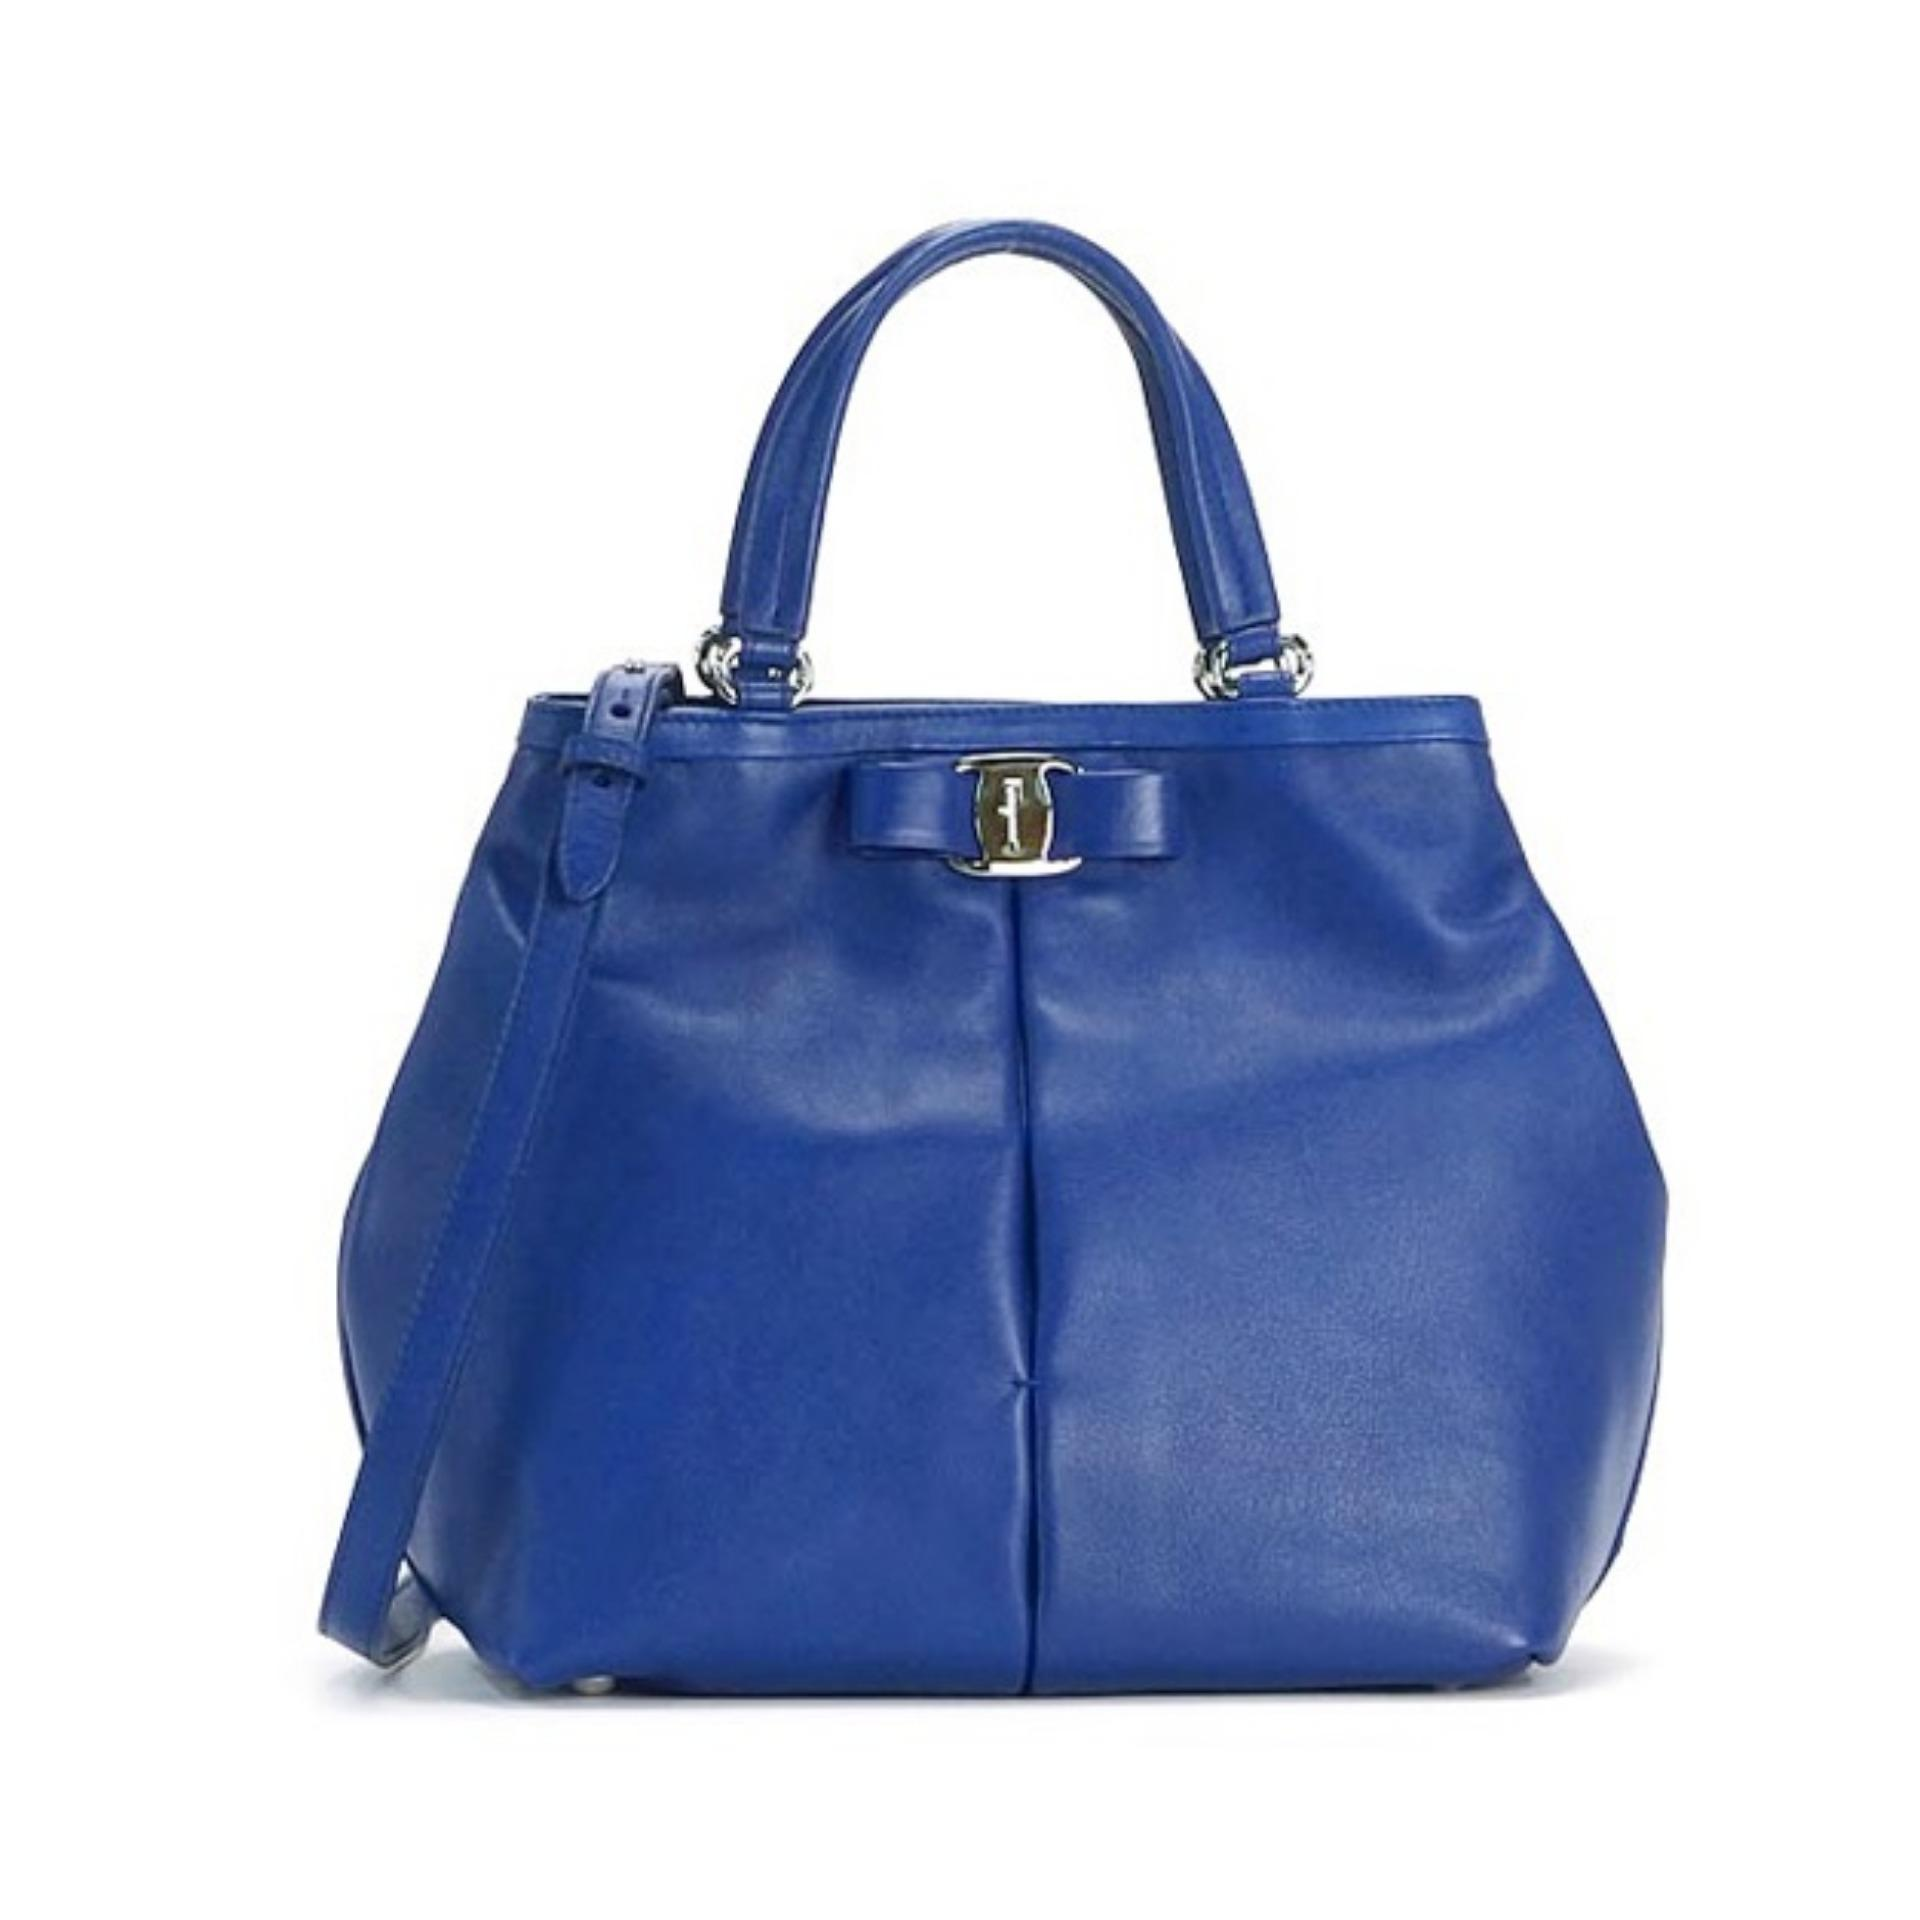 d3af586d5c Salvatore Ferragamo Ninette Bag (Blue)   21E309568522